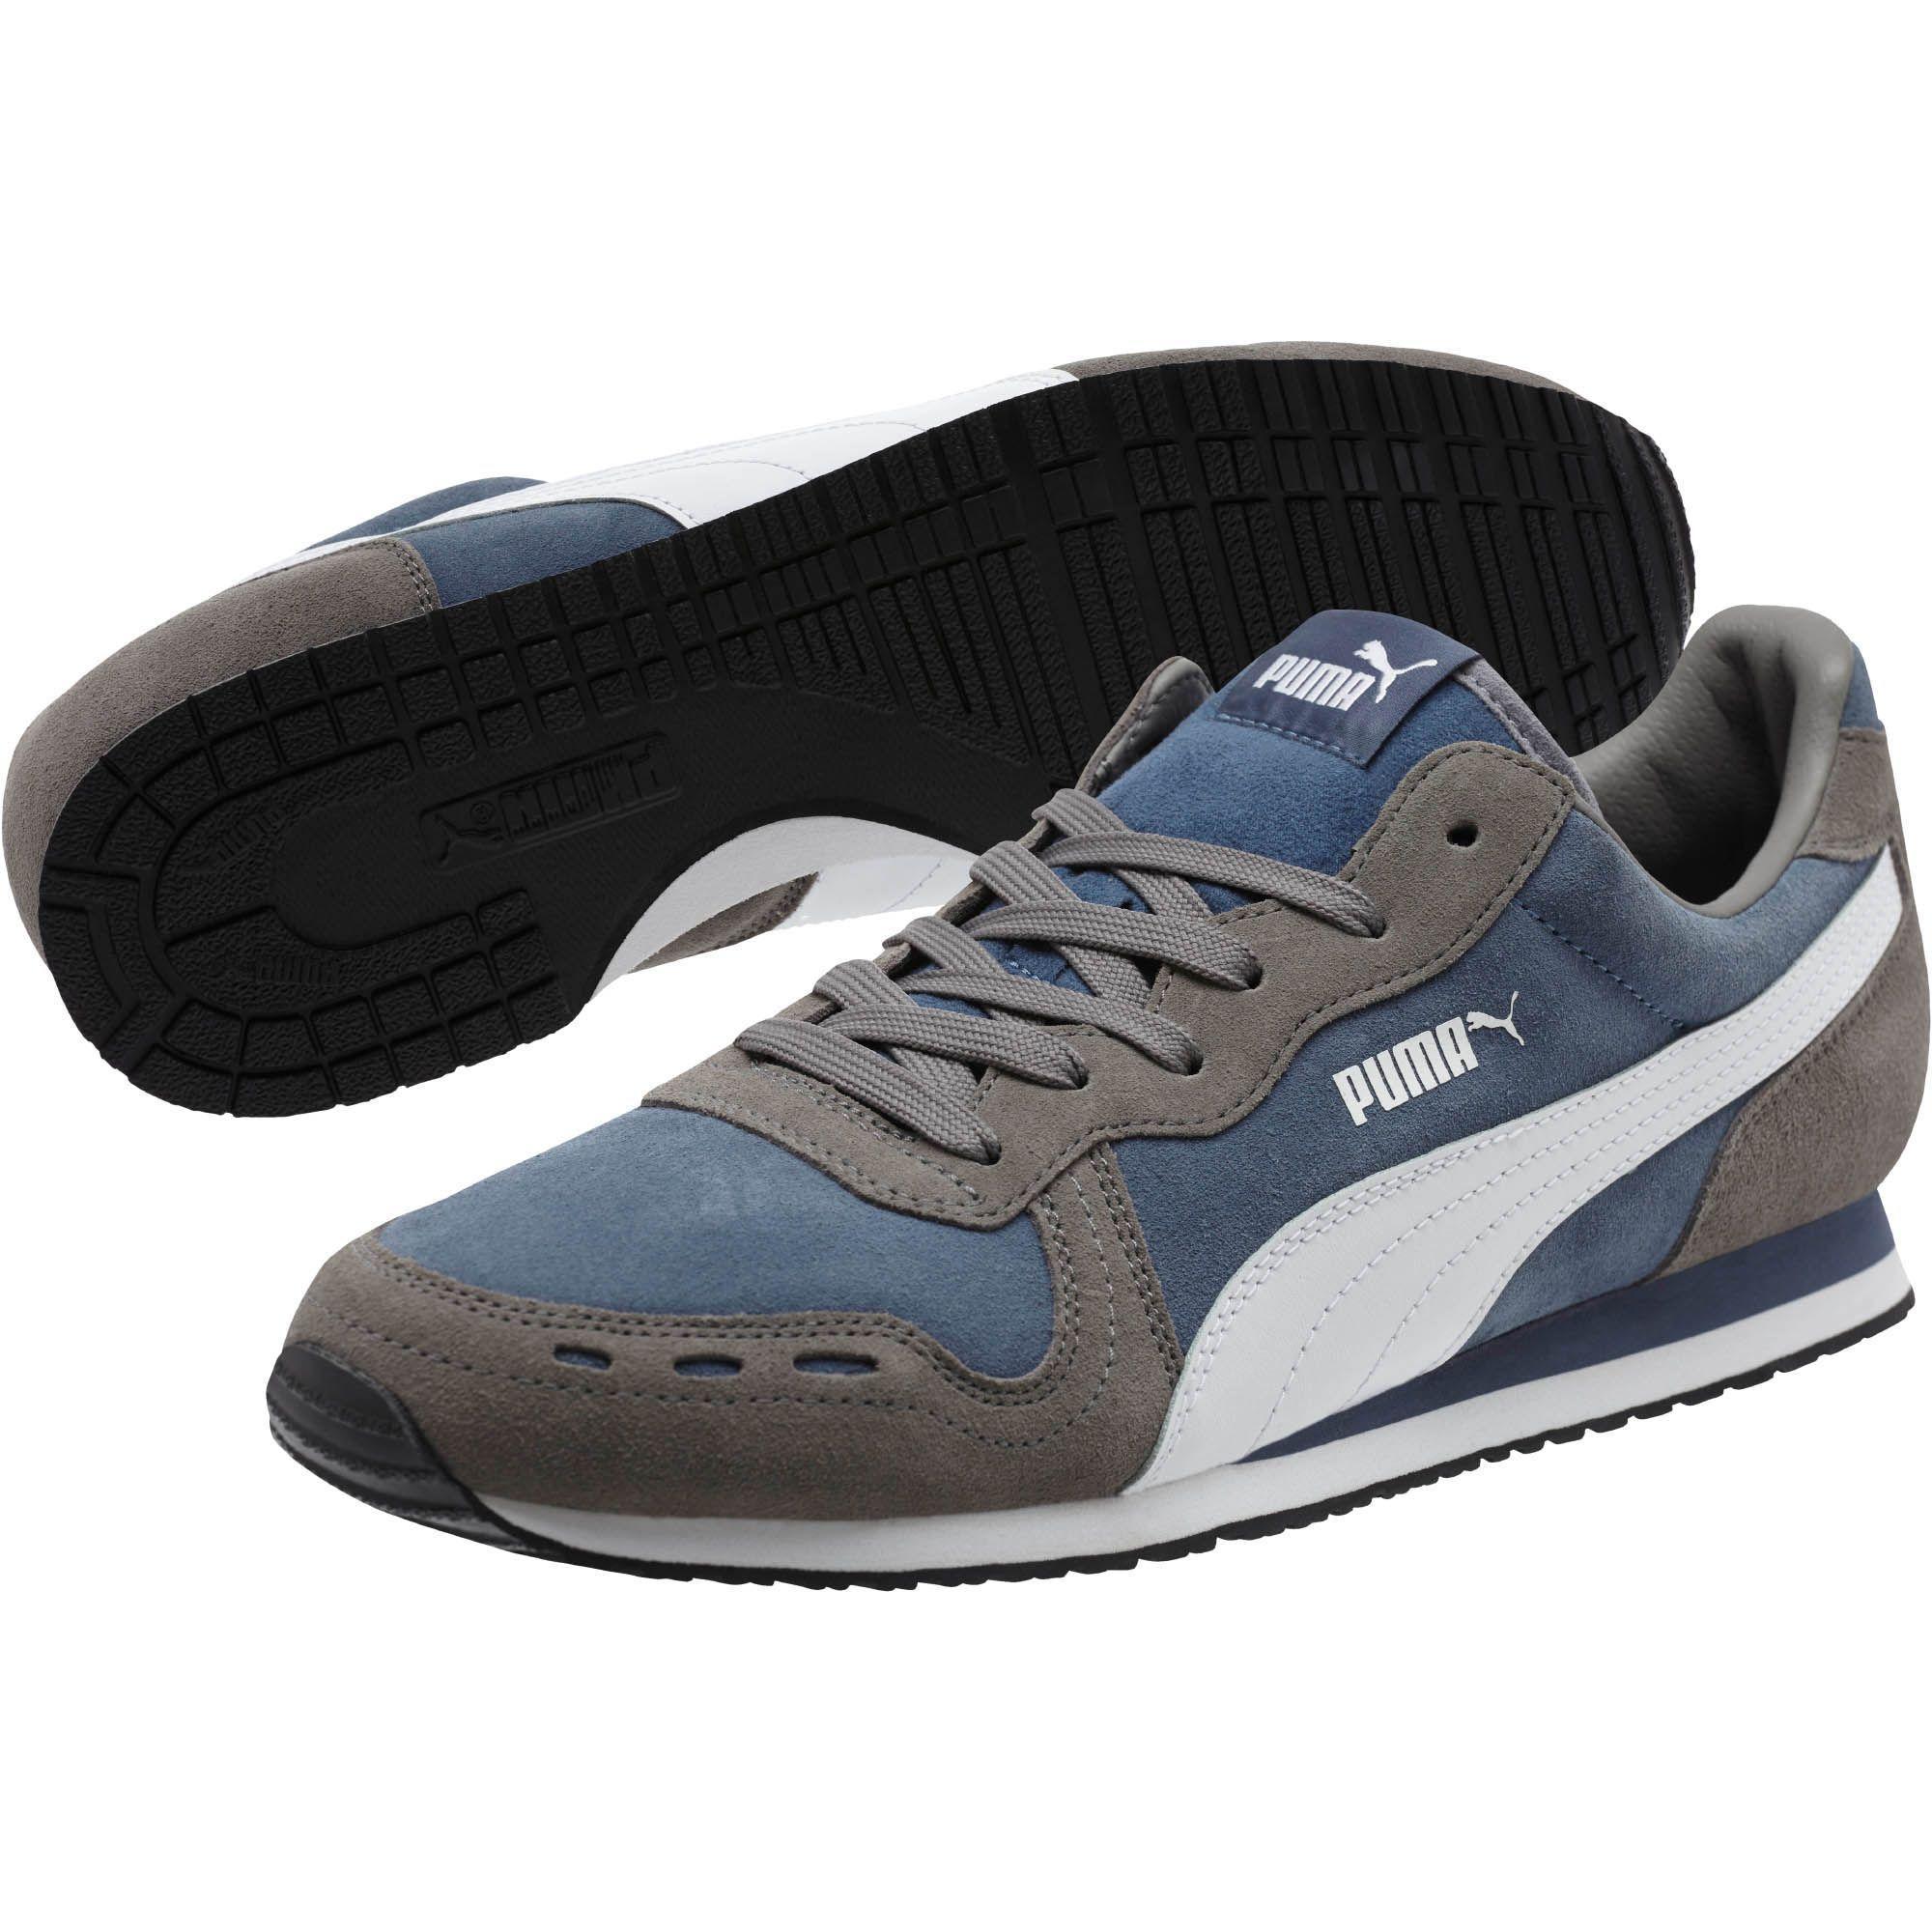 Lyst - PUMA Cabana Racer Suede Men s Sneakers for Men f42793620